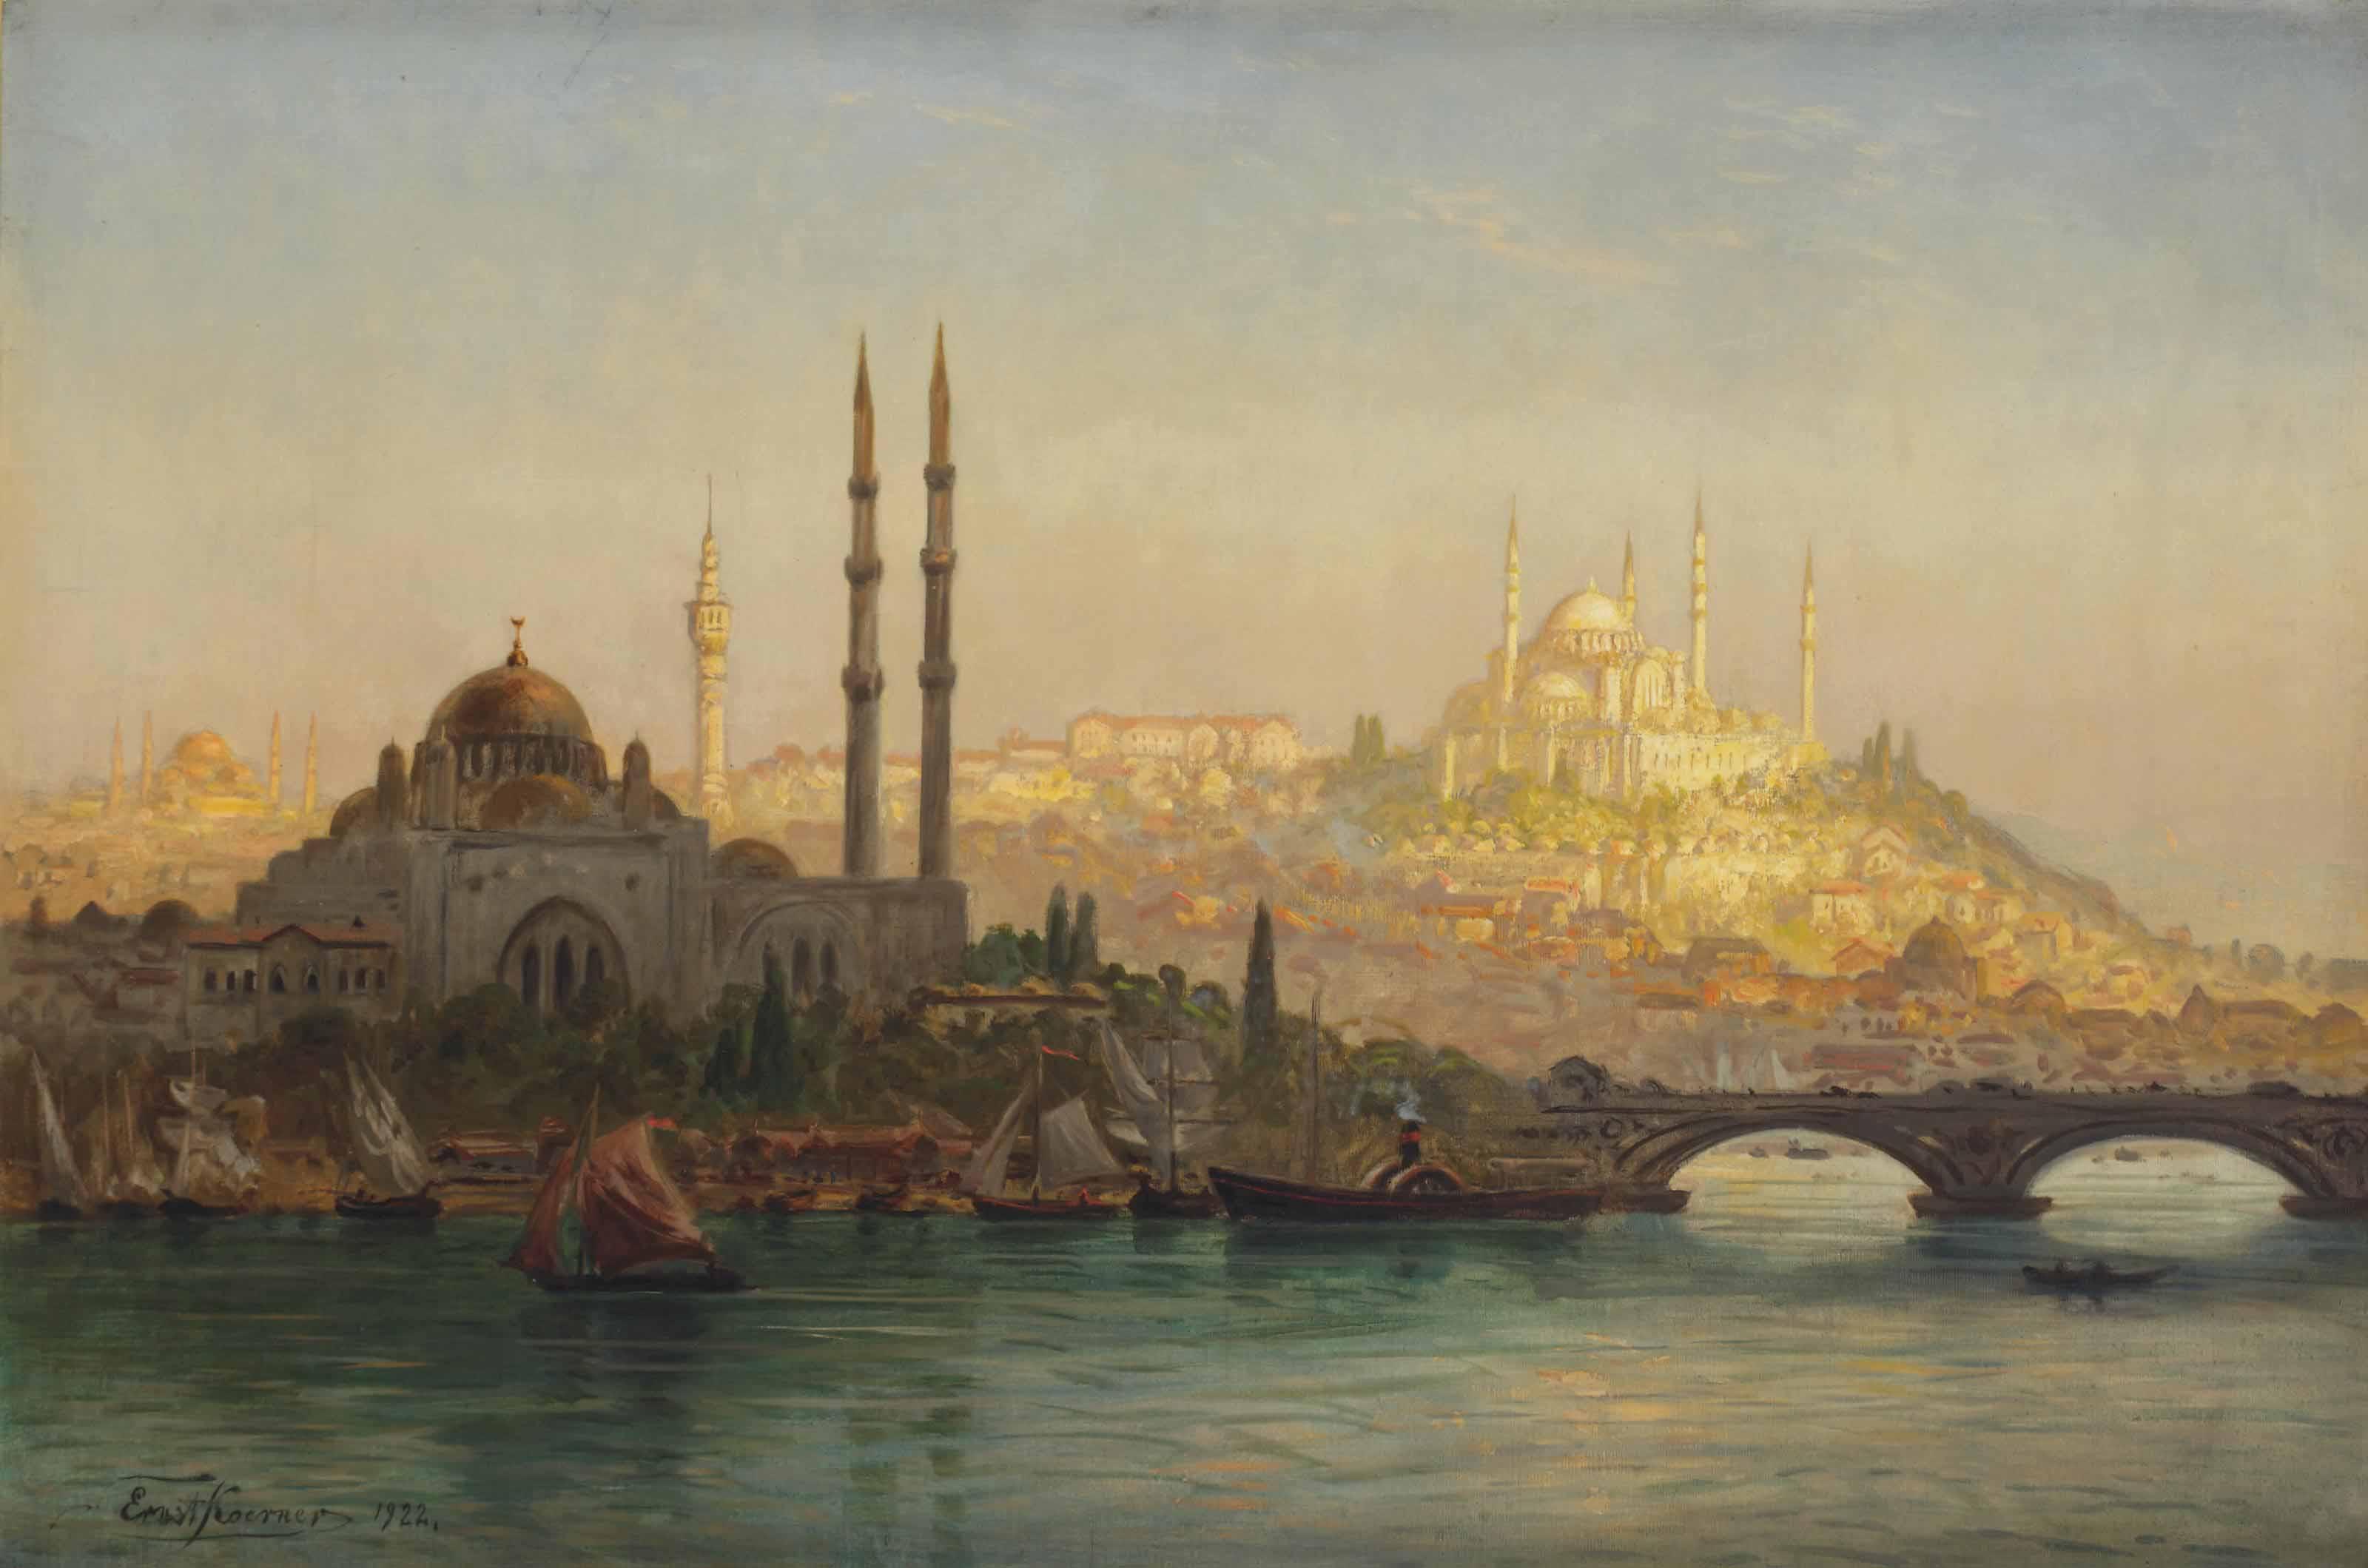 Istanbul, Valide und Solimanie Moschee; Istanbul, Valide and the Suleymaniye mosque